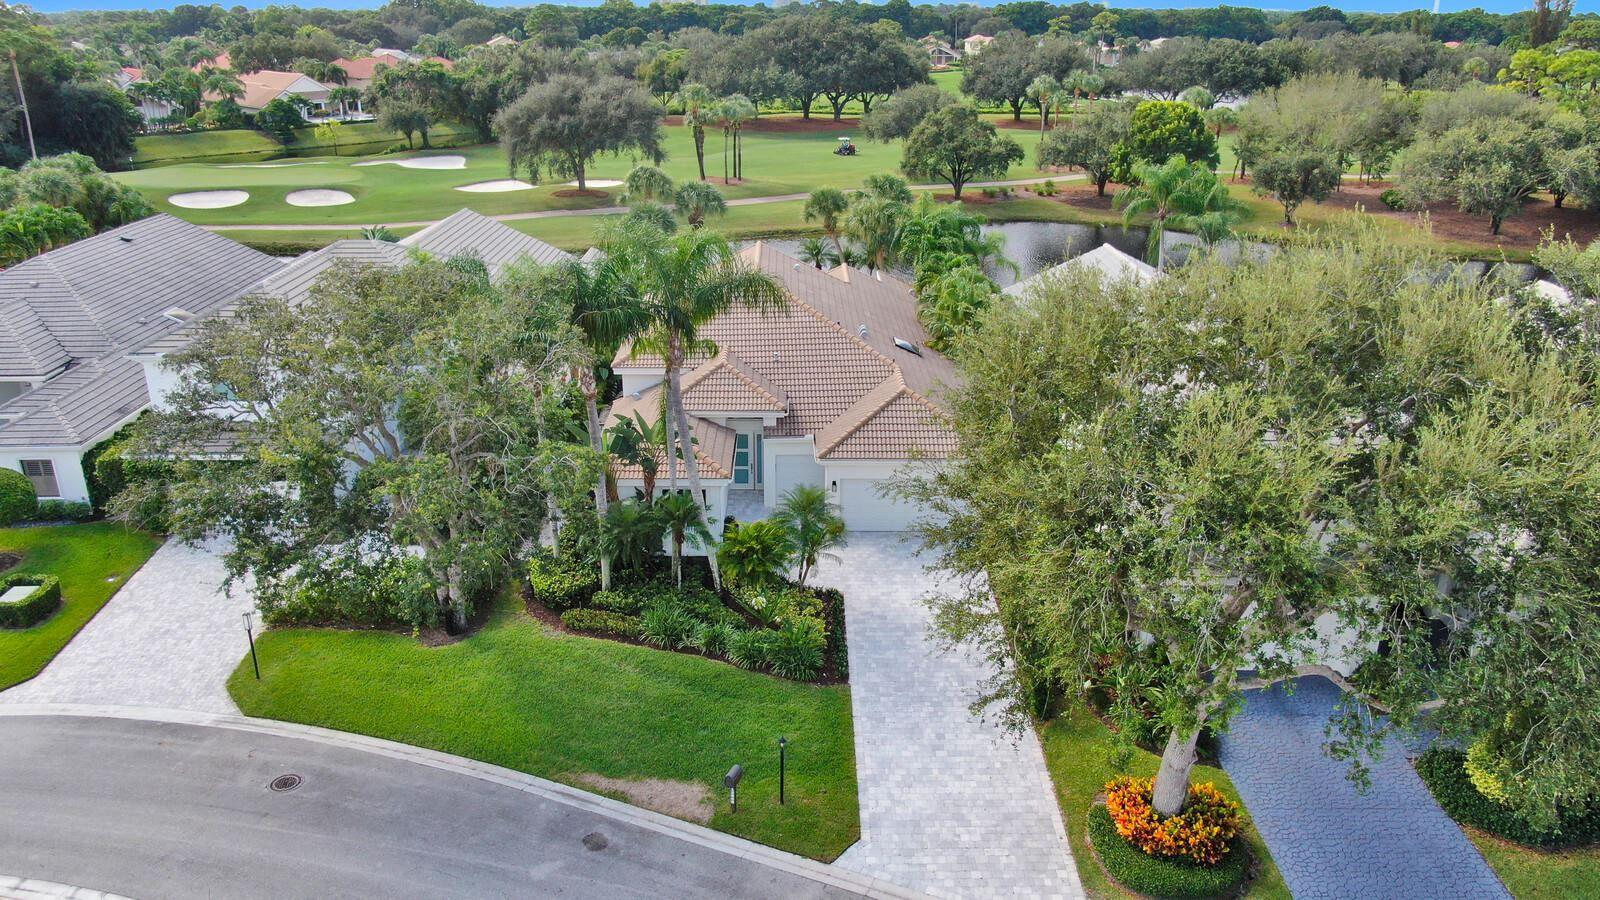 Photo of 13249 Provence Drive, Palm Beach Gardens, FL 33410 (MLS # RX-10660627)